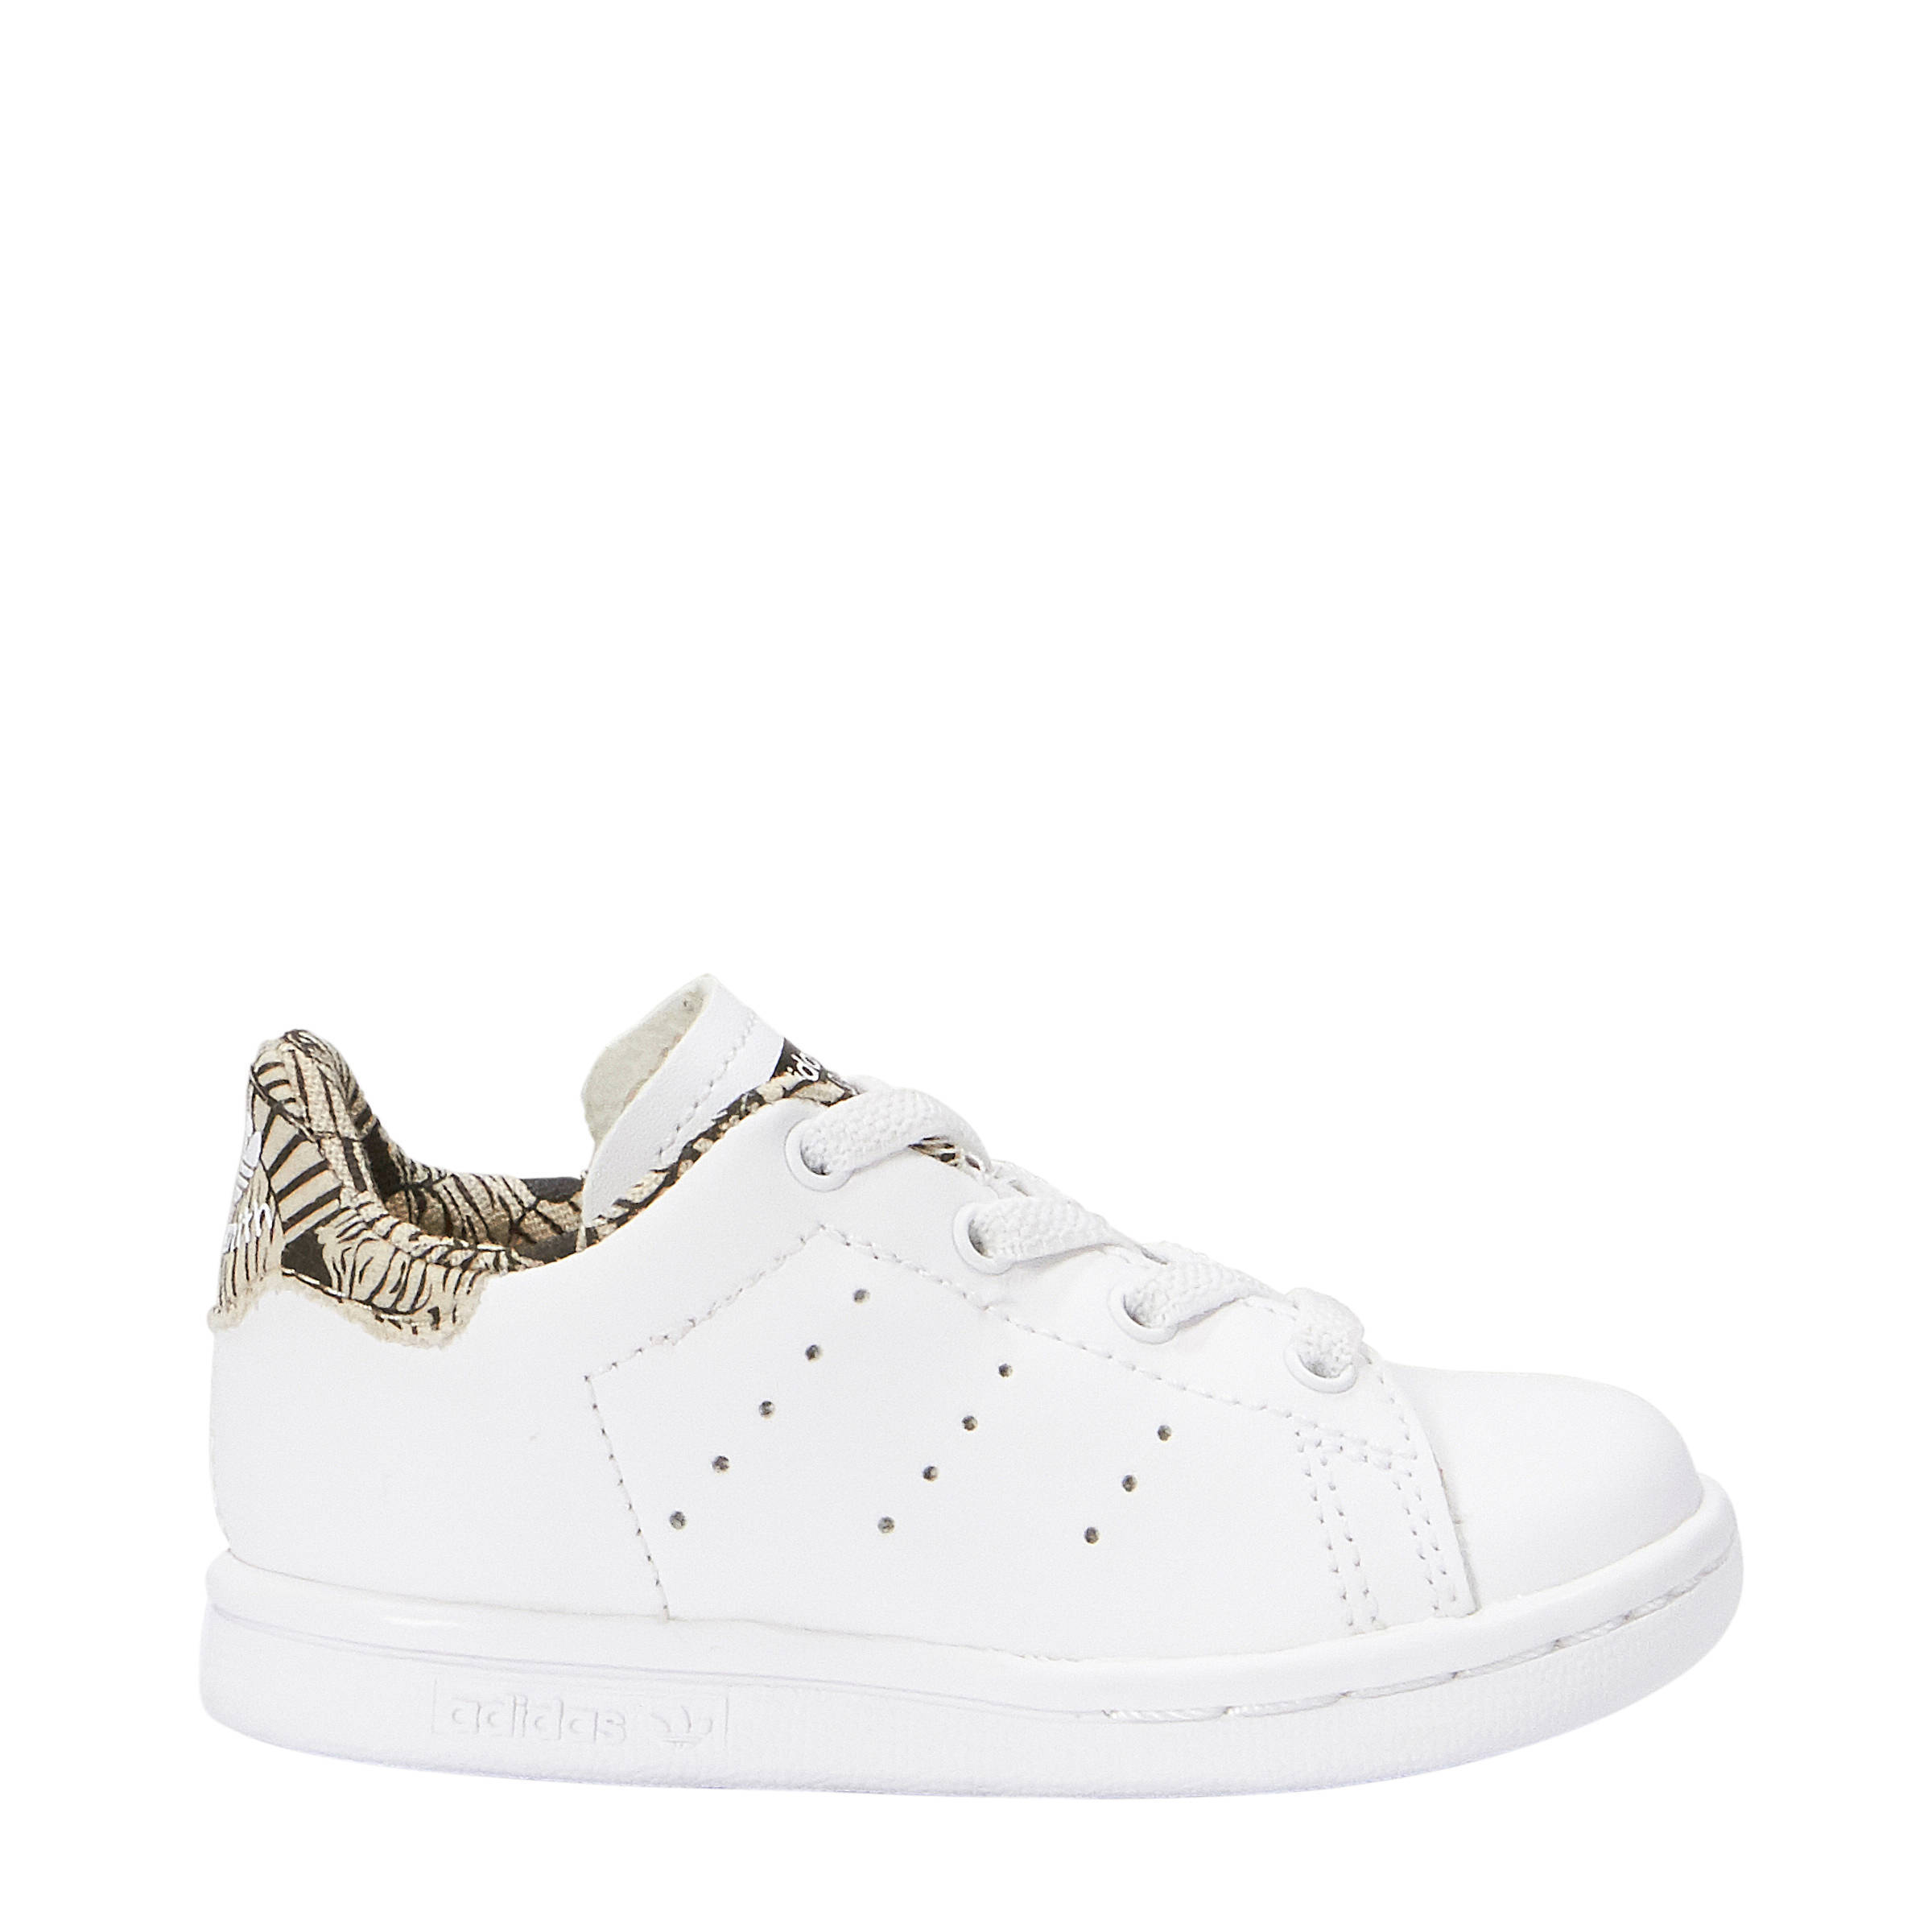 originals Stan Smith EL I sneakers